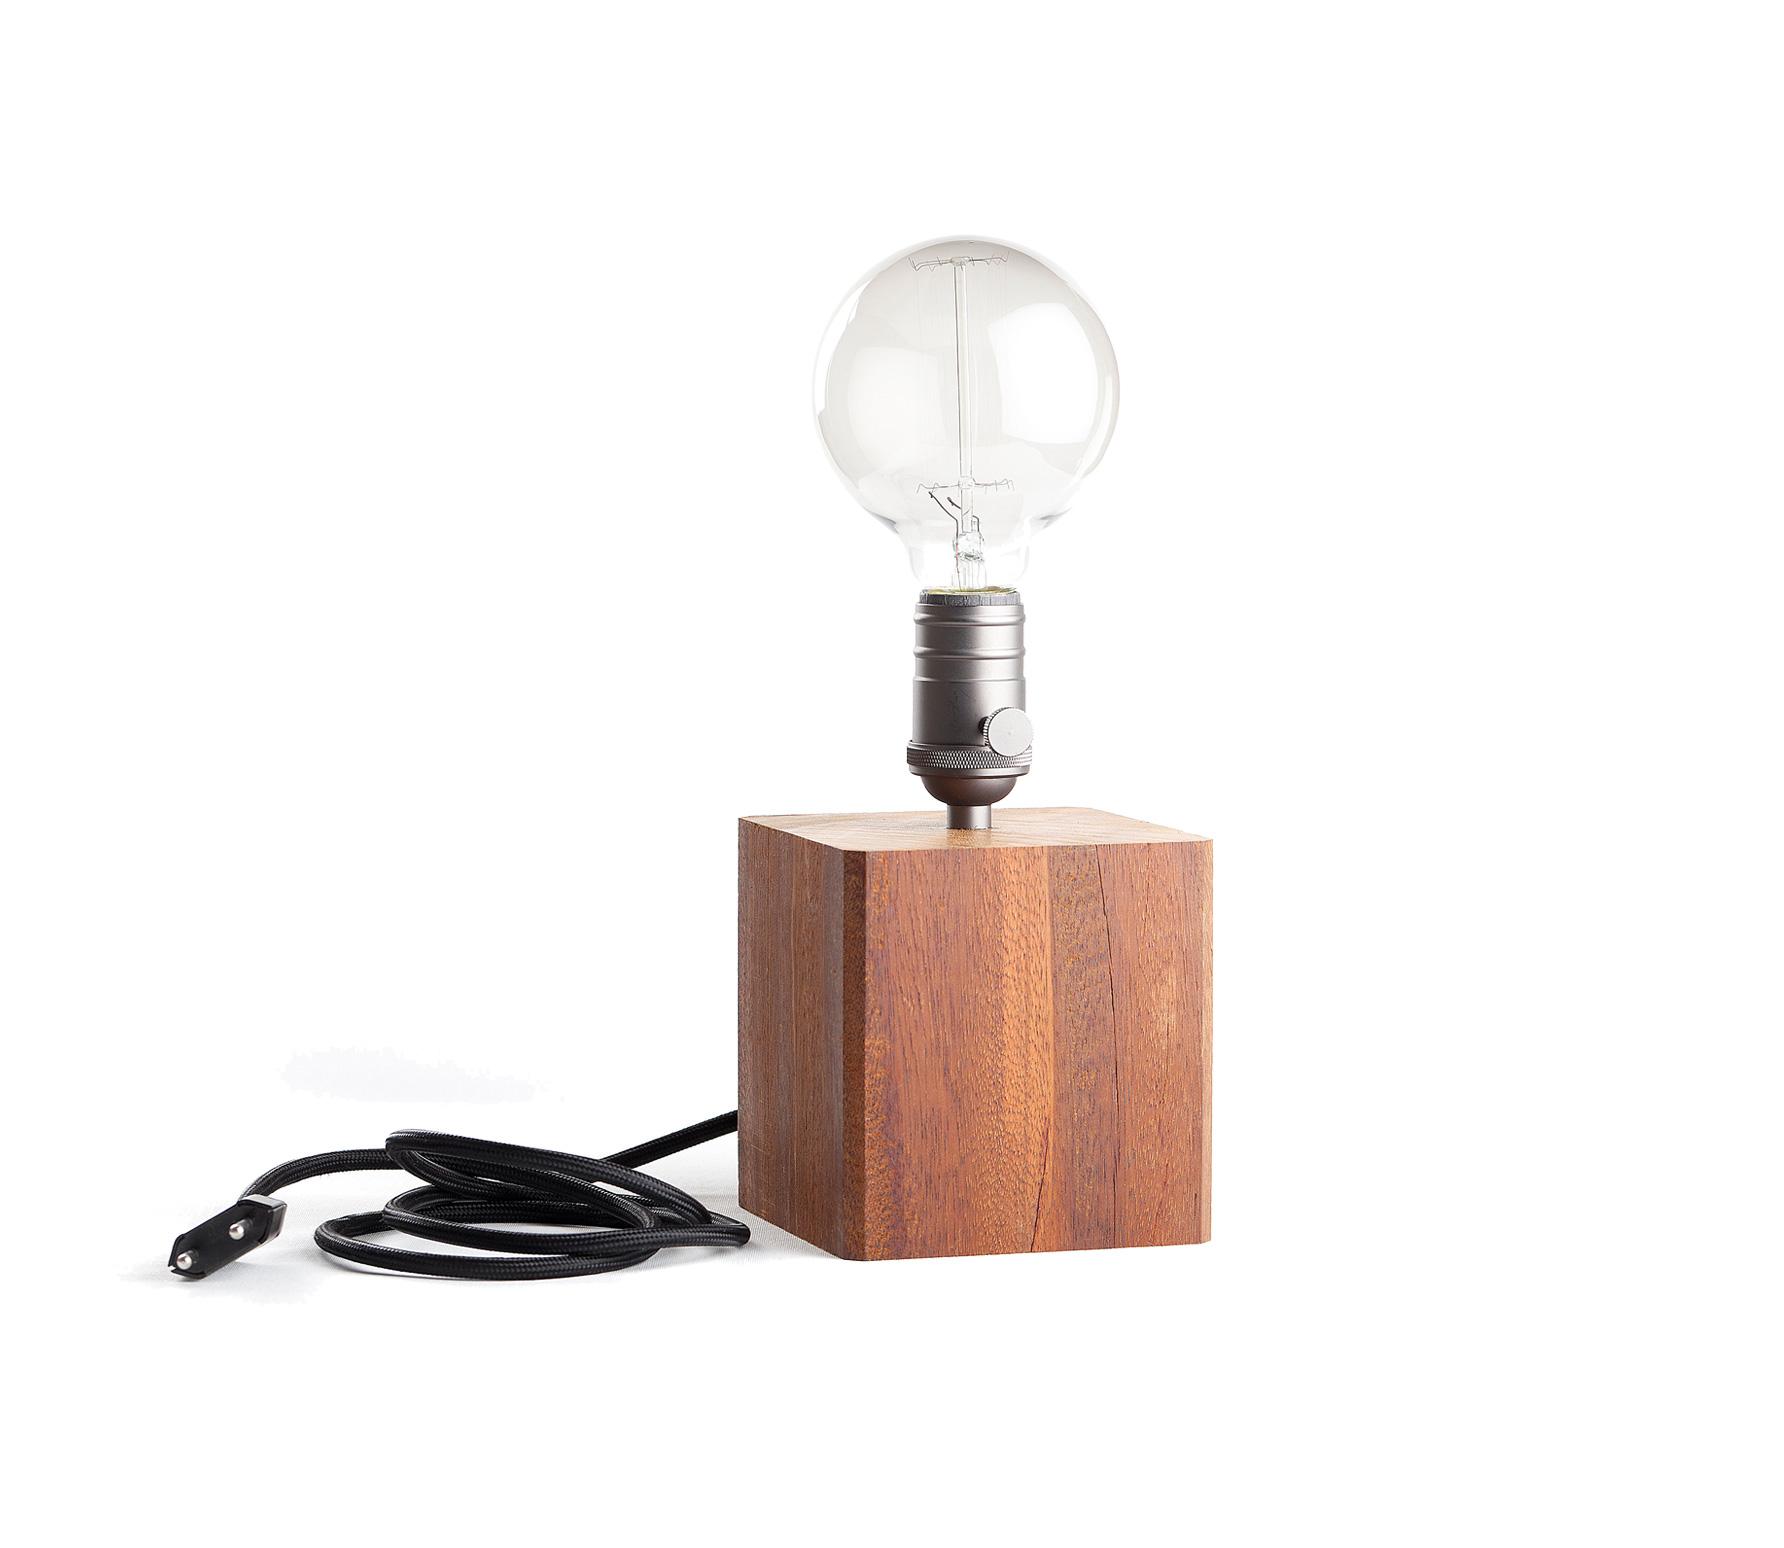 Industriële tafellamp hout incl lamp Hout